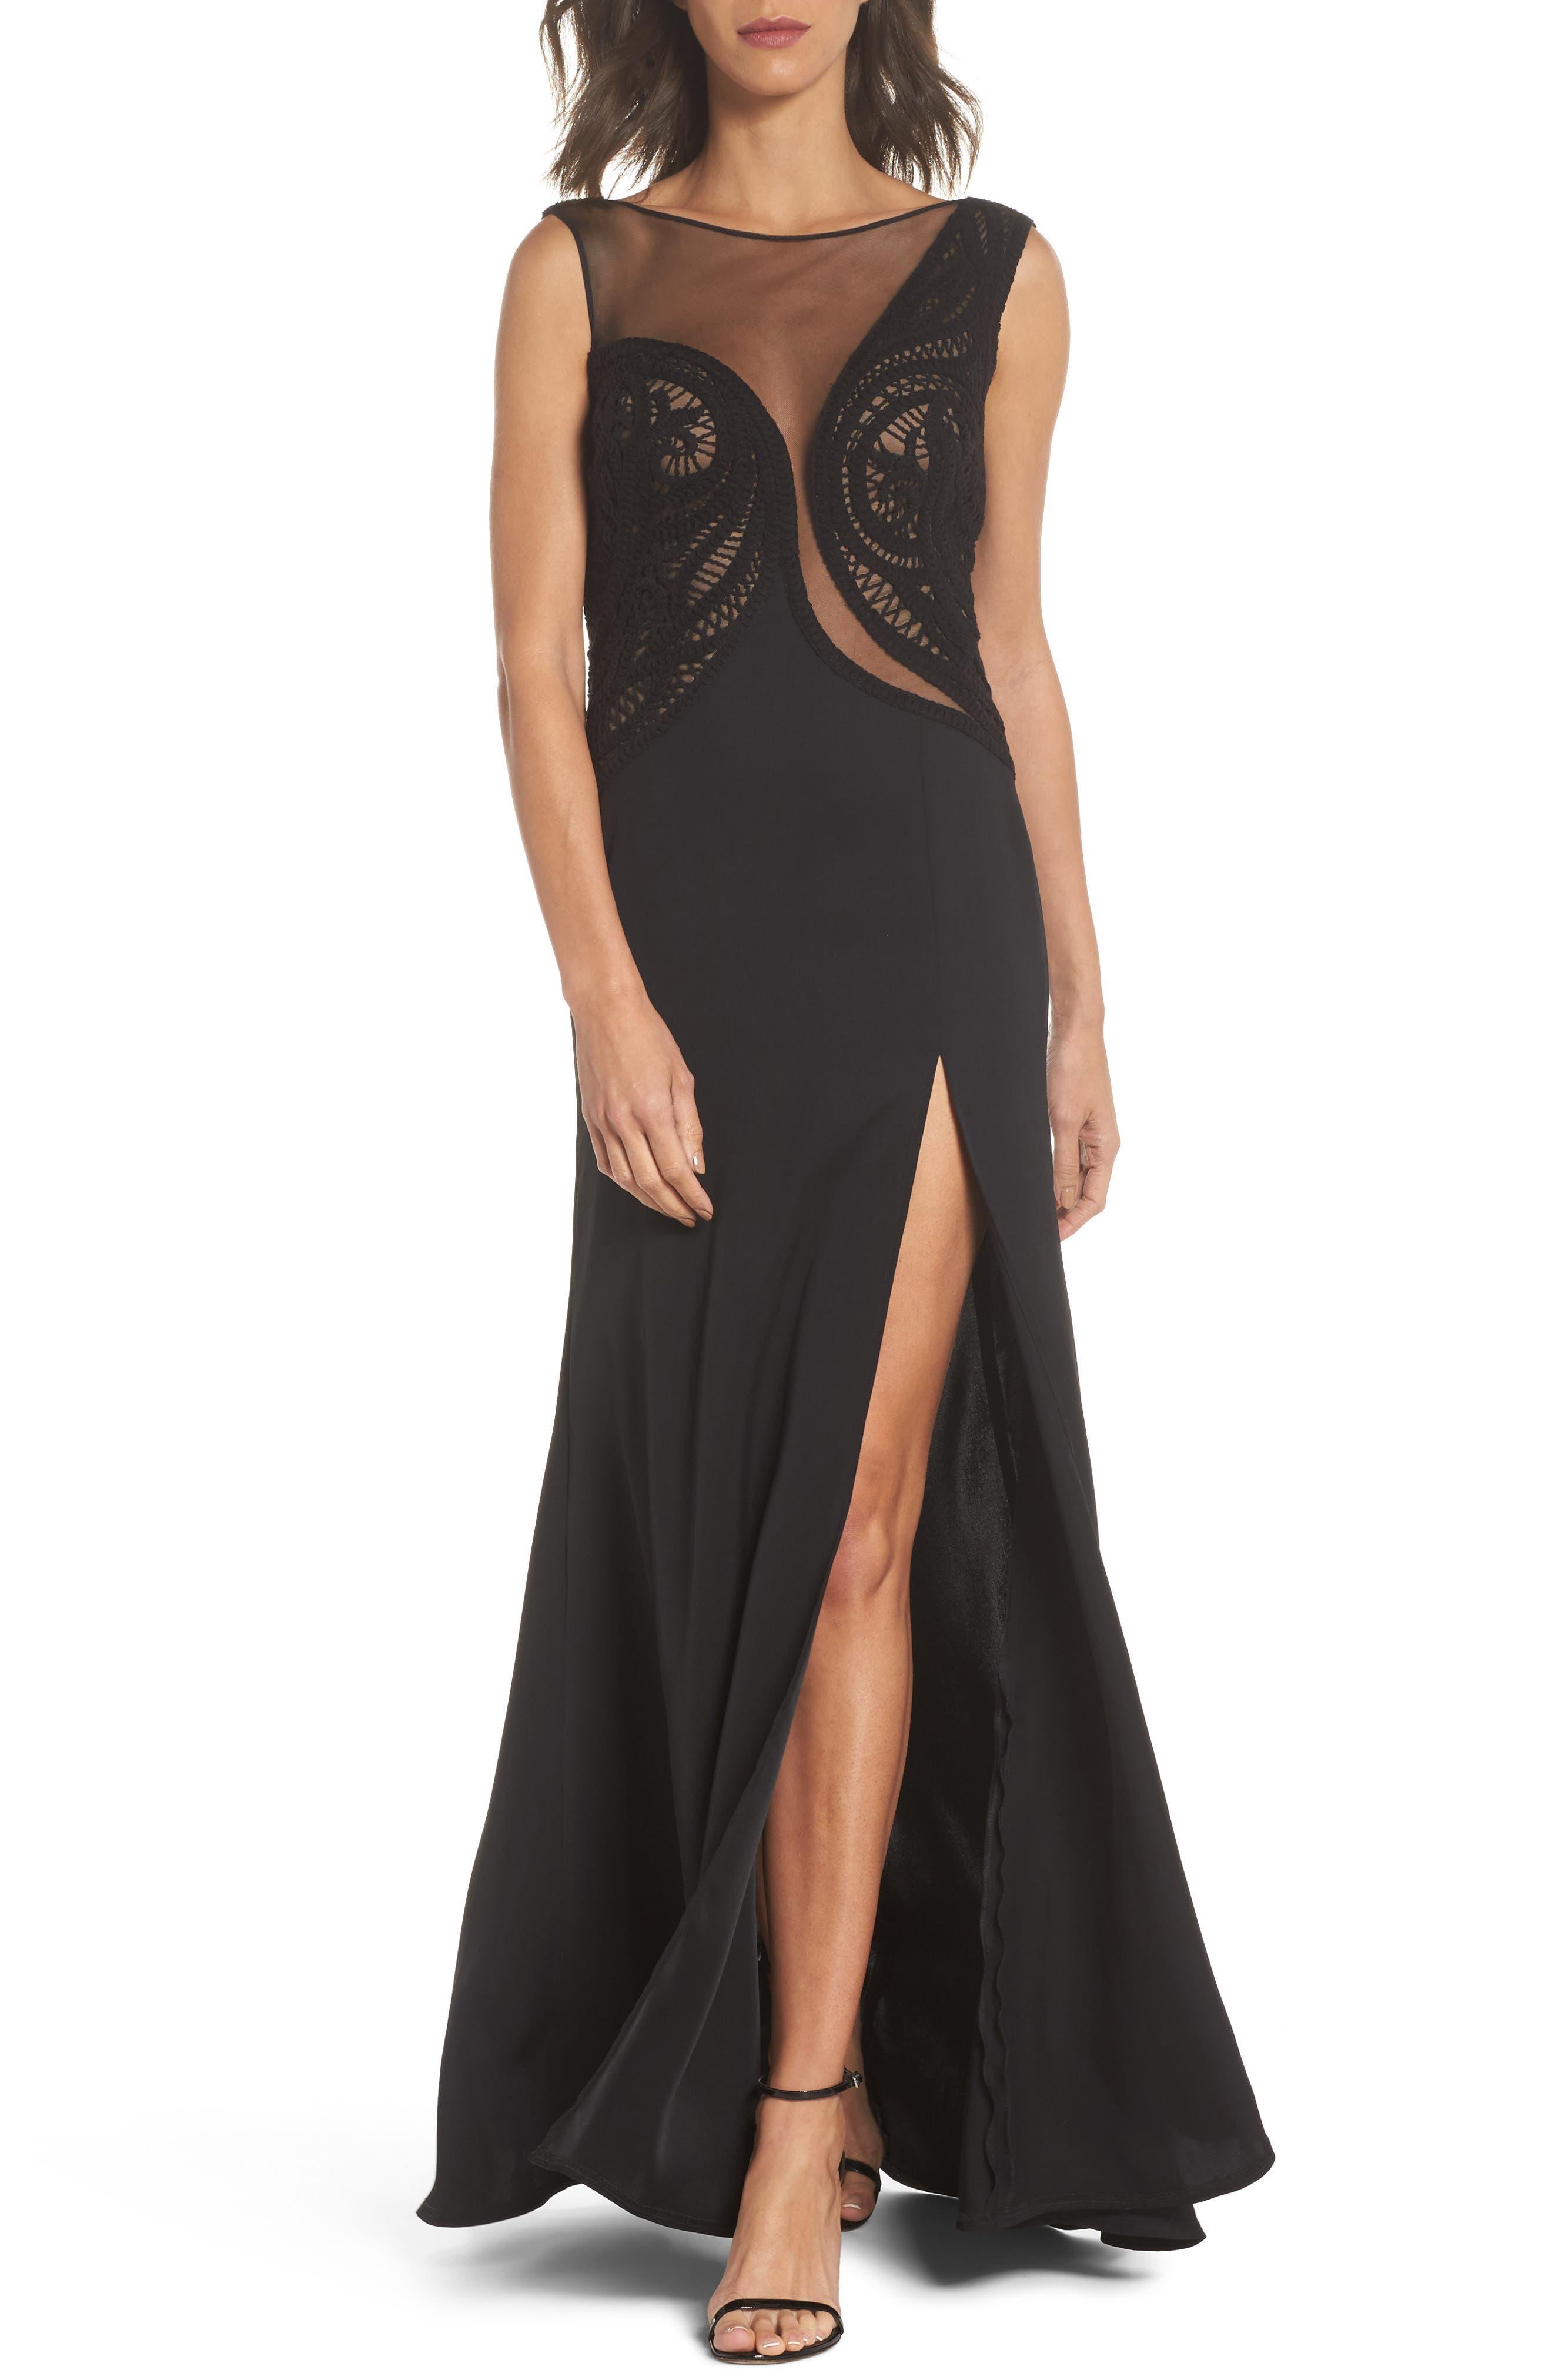 Crochet Lace Gown,                         Main,                         color, Black/ Nude